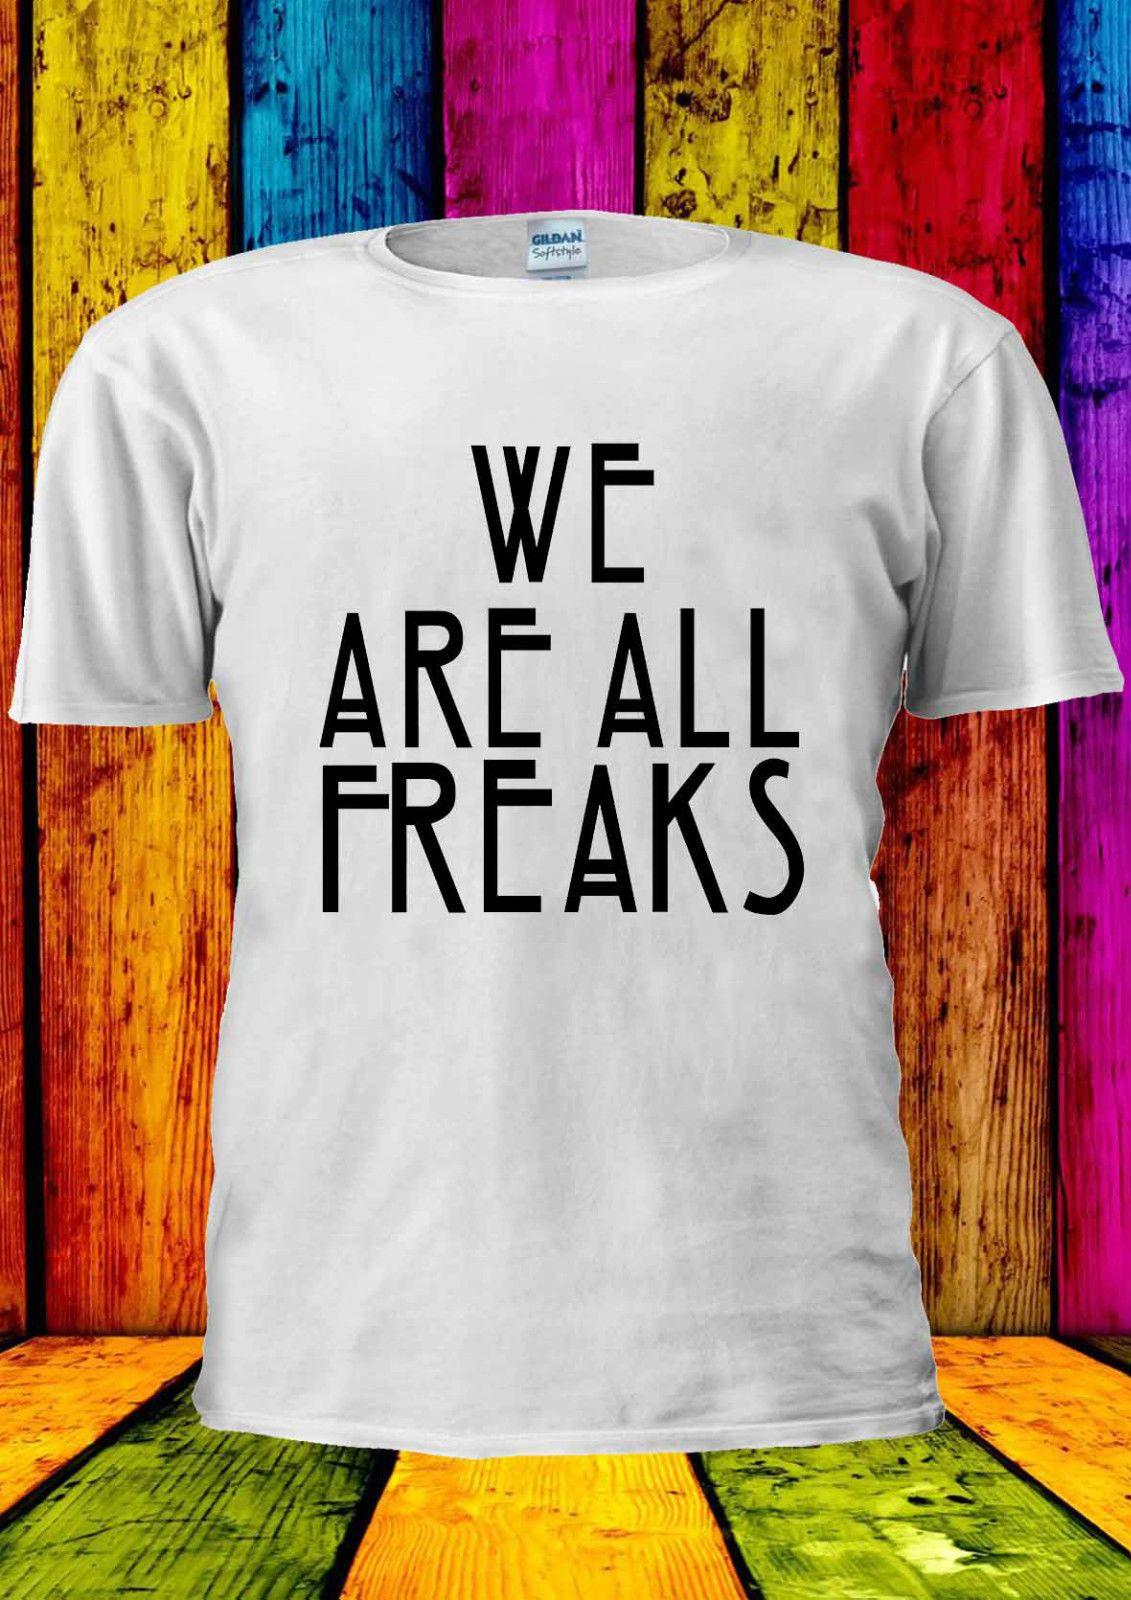 2628d439e82583 We Are All Freaks Funny Tumblr Urban T Shirt Vest Tank Top Men Women Unisex  1773 Adult T Shirt Cotton